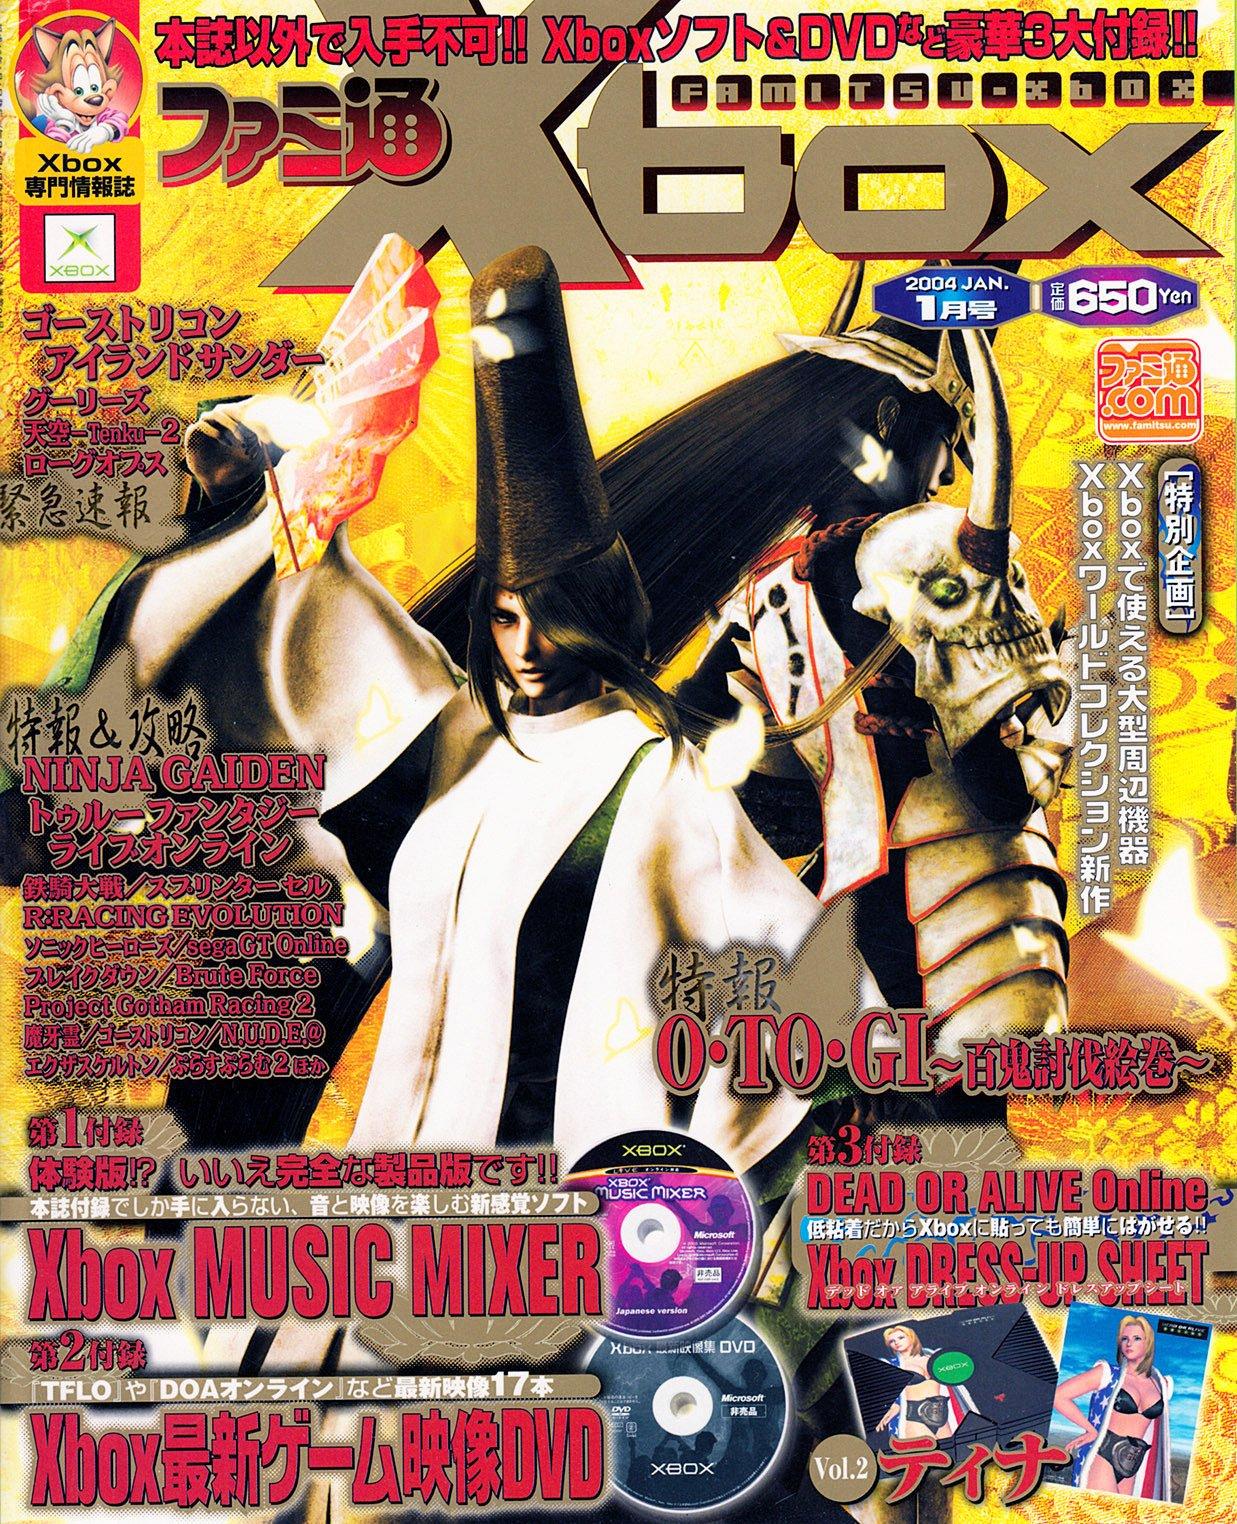 Famitsu Xbox Issue 023 (January 2004)